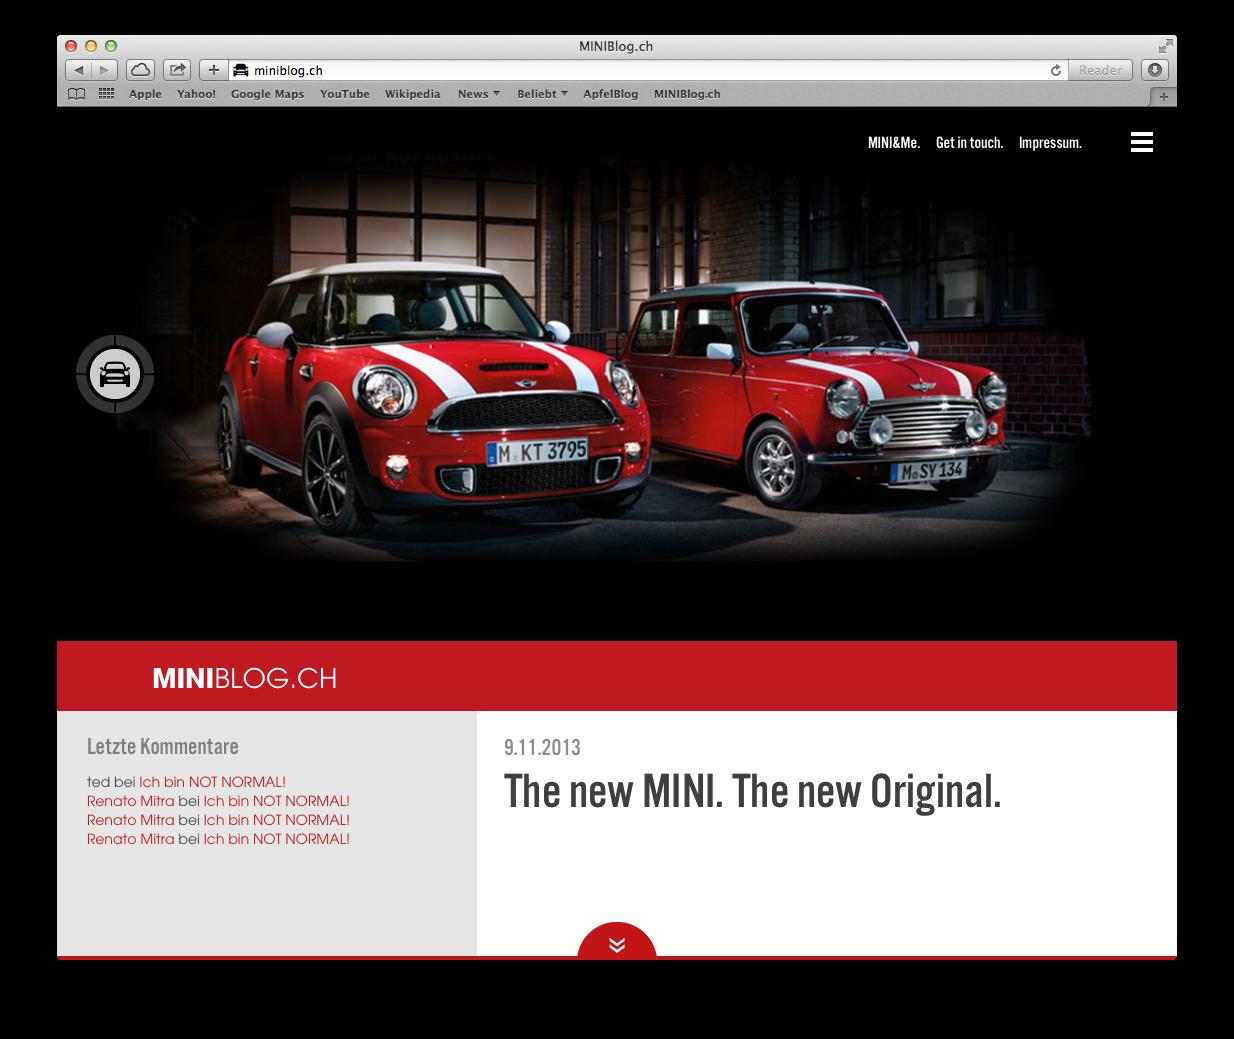 MINIBlog.ch